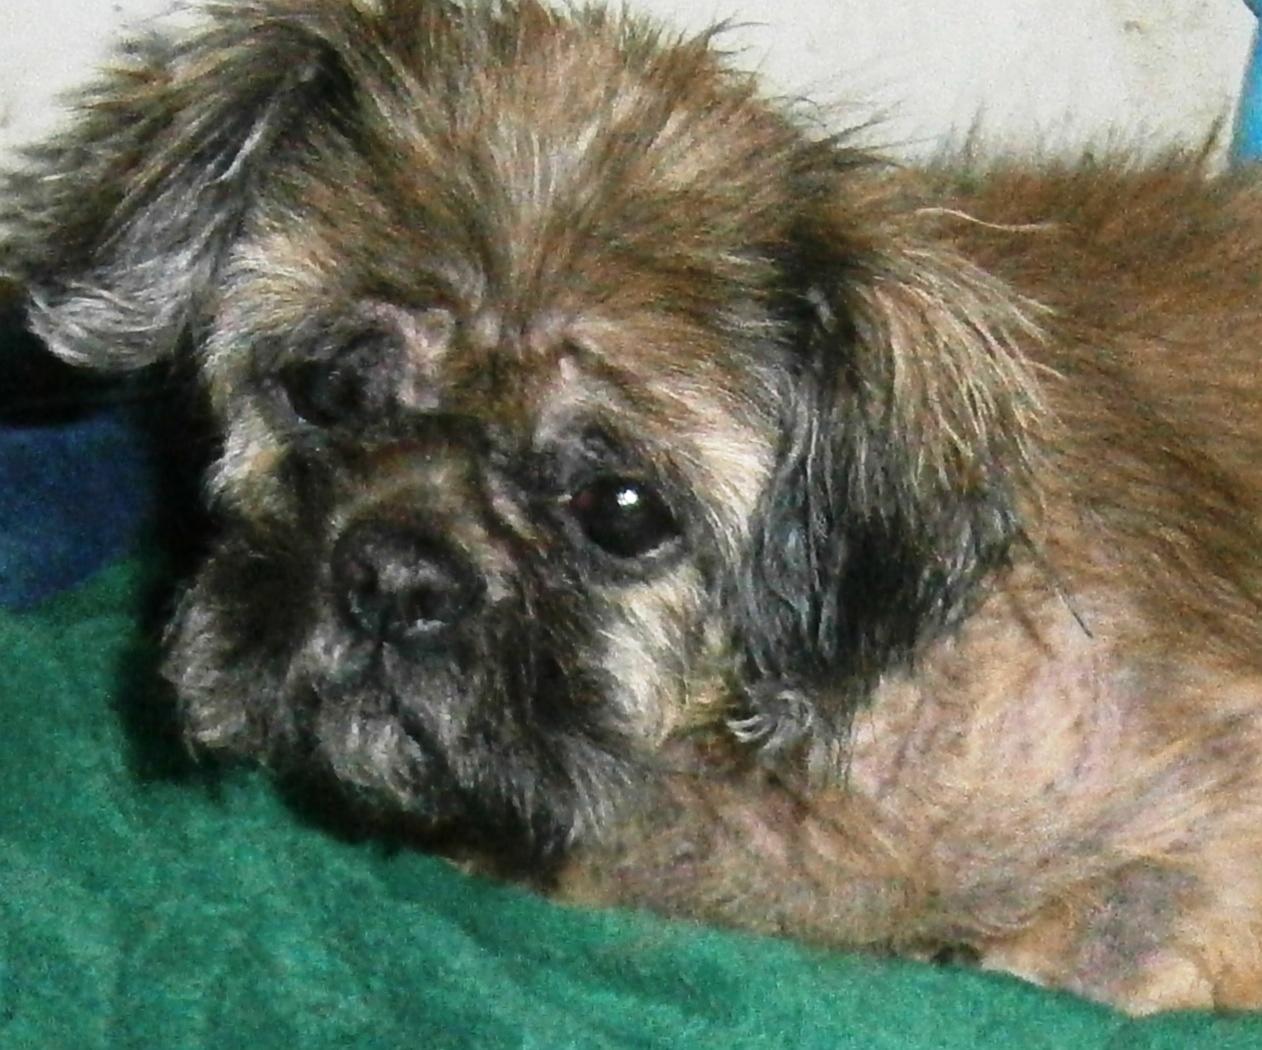 Dog Fibroma Peripheral Odontogenic